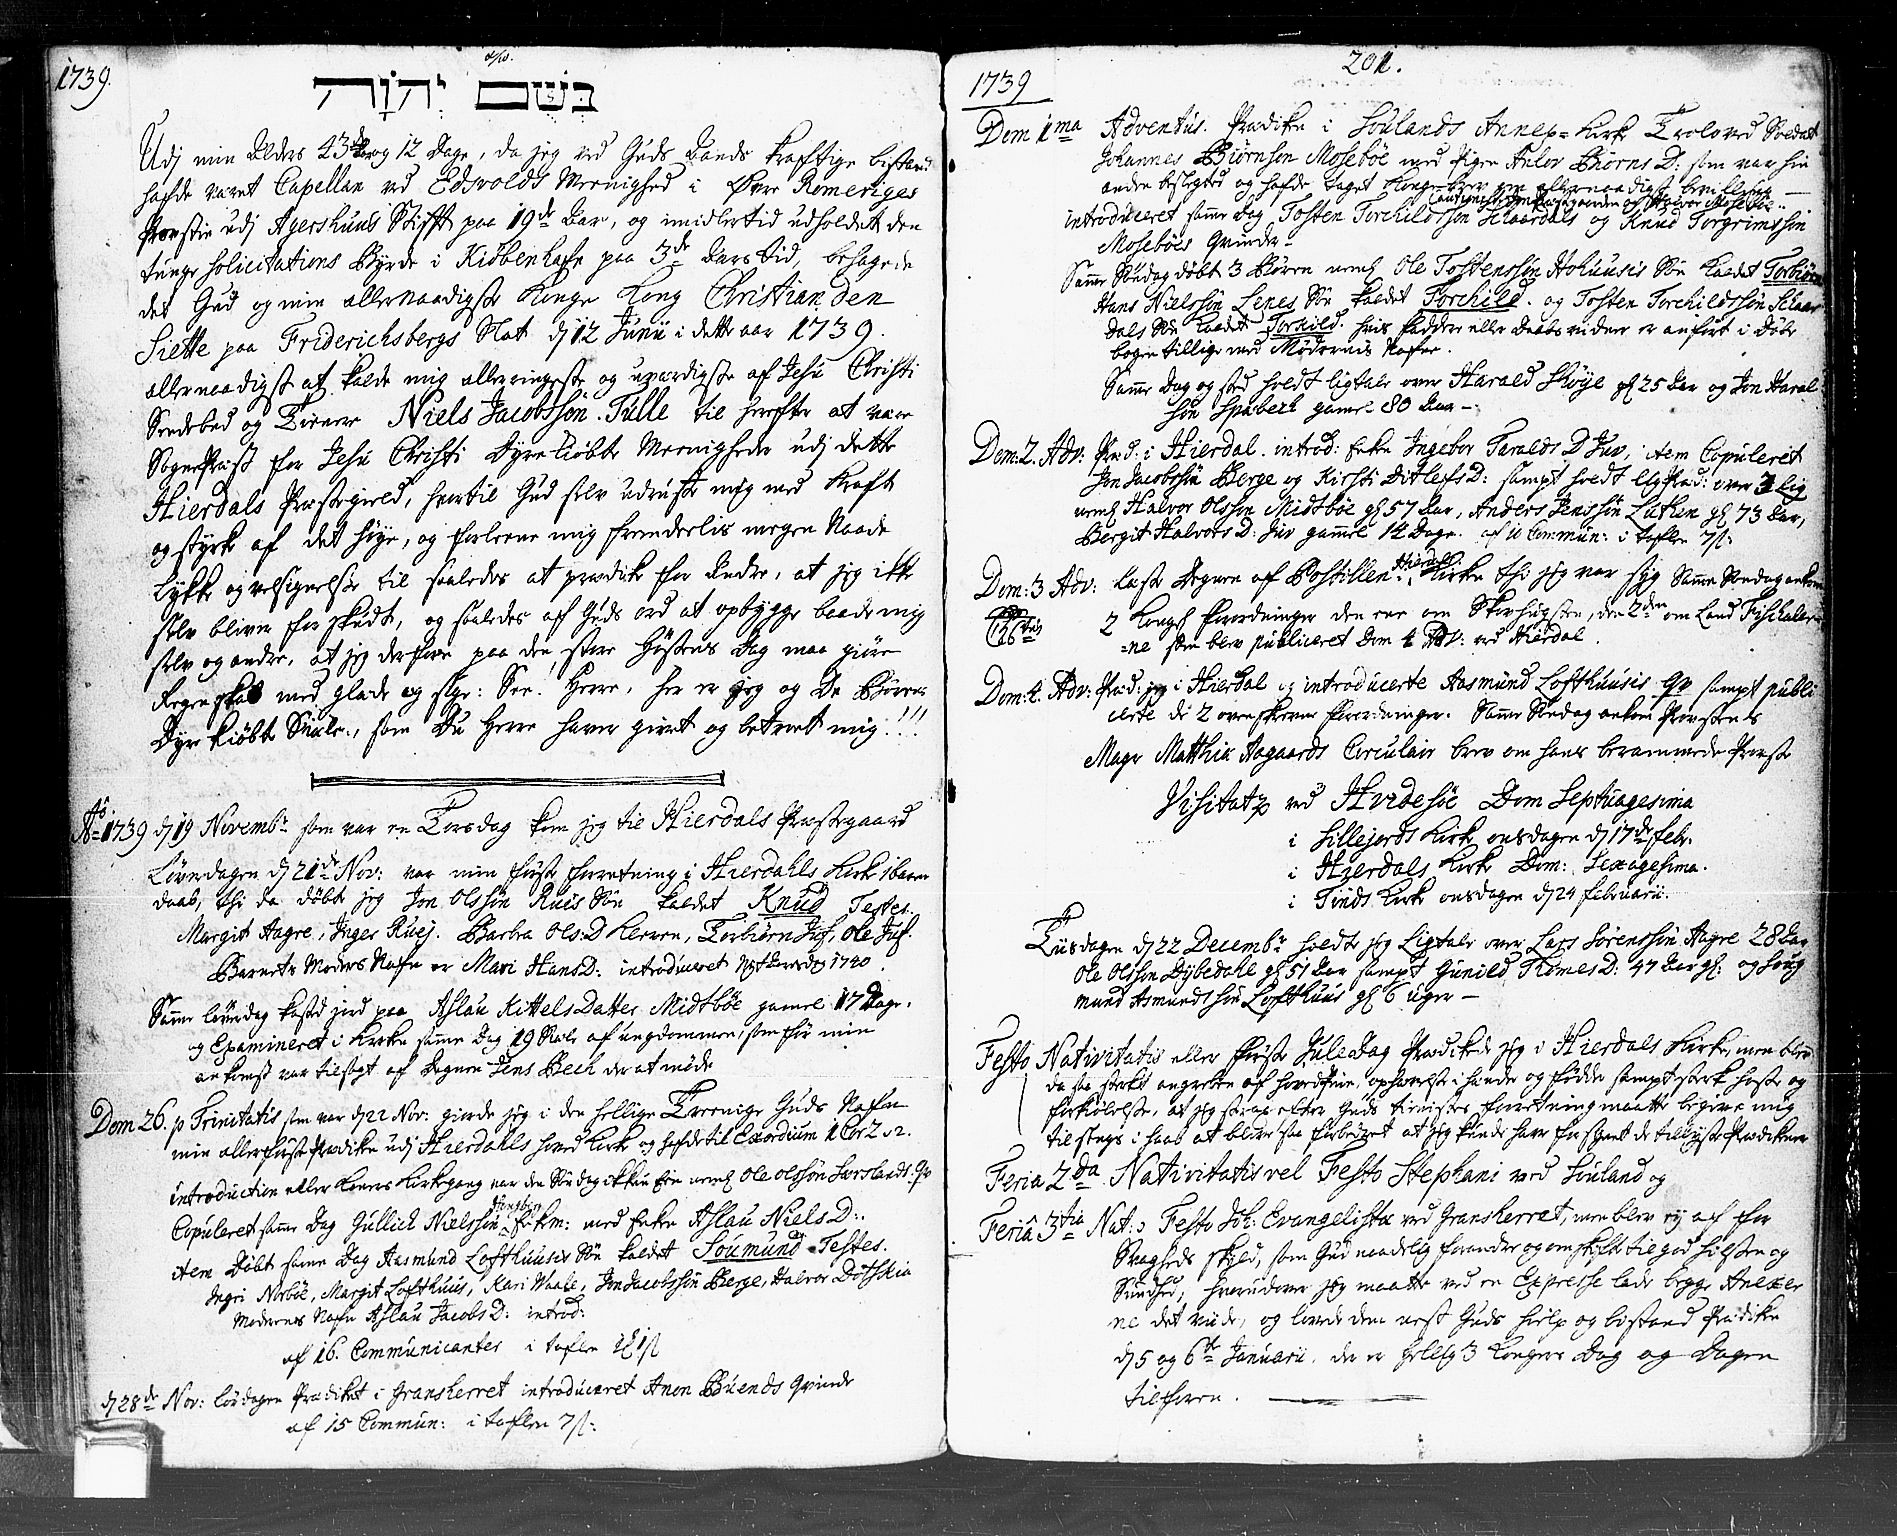 SAKO, Hjartdal kirkebøker, F/Fa/L0002: Ministerialbok nr. I 2, 1716-1754, s. 200-201